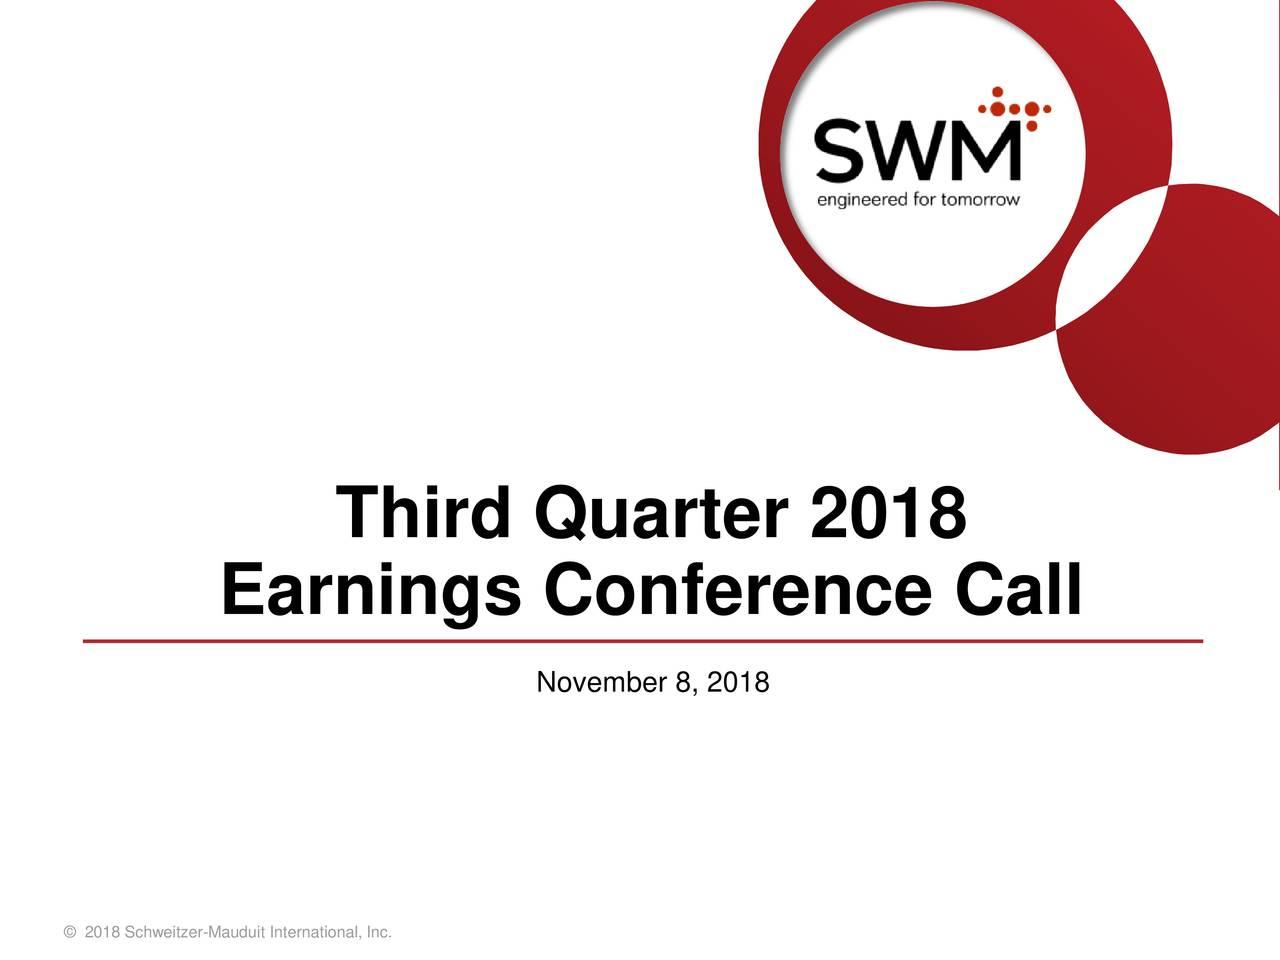 Earnings Conference Call November 8, 2018